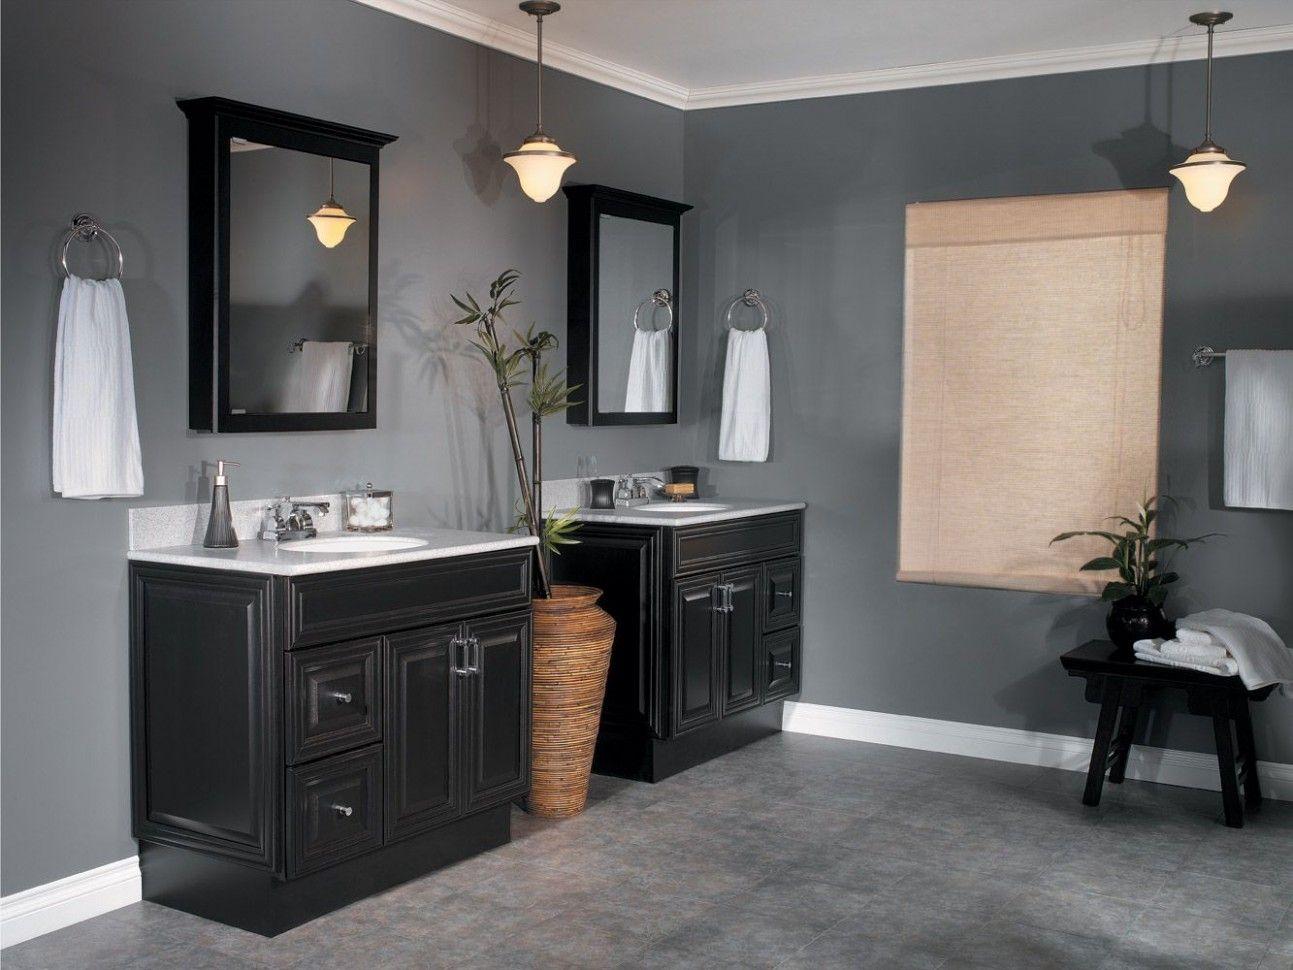 Bathroom Color Ideas With Dark Wood Cabinets Black Vanity Bathroom Black Cabinets Bathroom Bathroom Wall Colors Dark gray bathroom decor